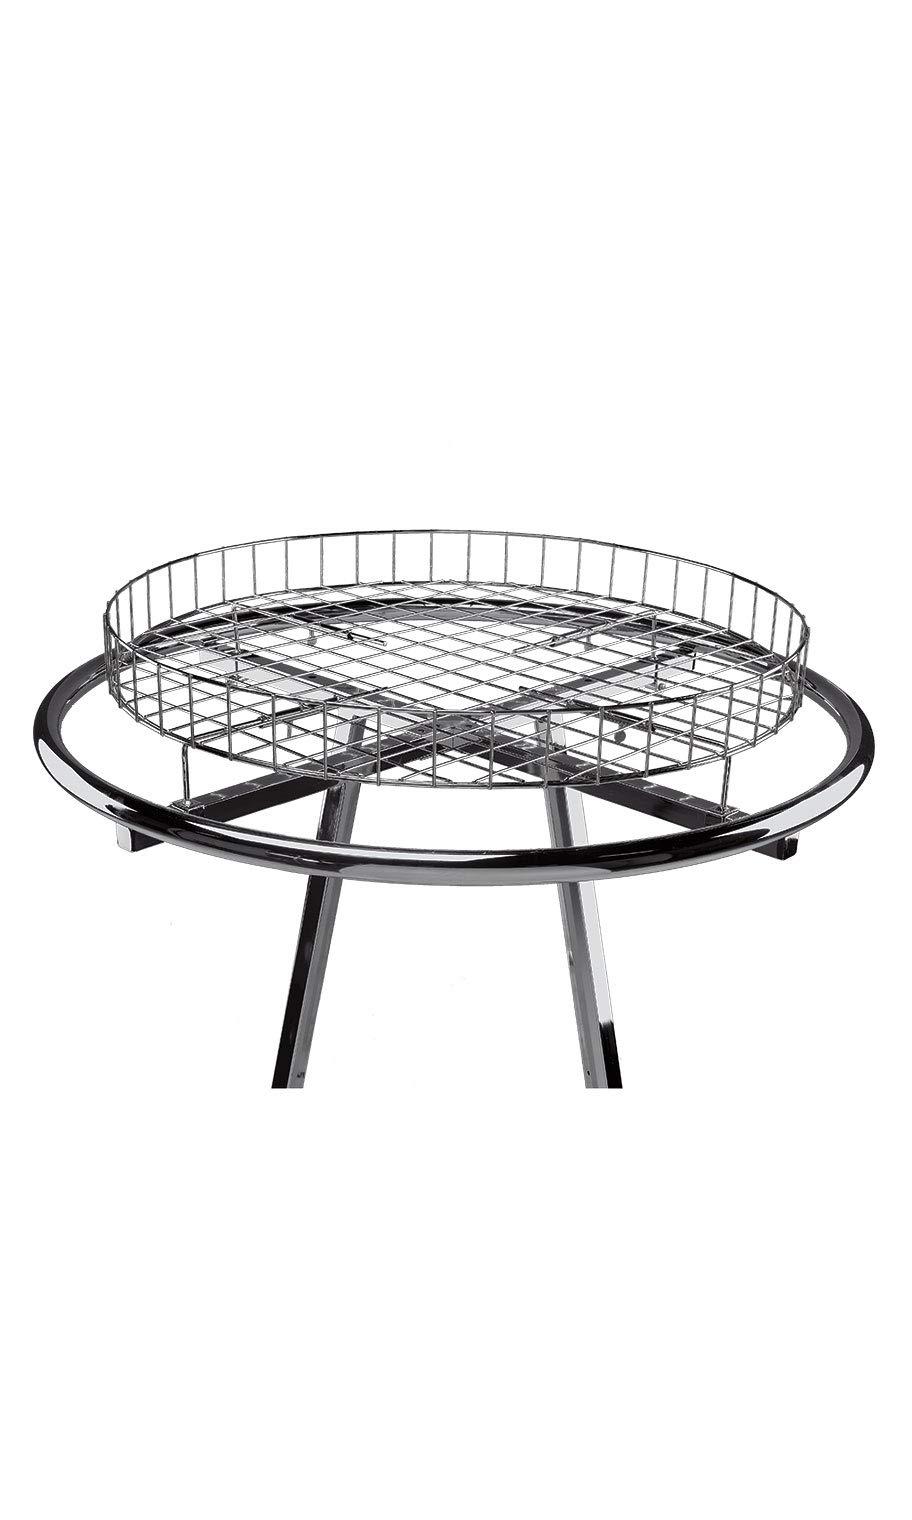 SSWBasics Wire Basket Round Clothing Rack Topper (30 ½ inch Diameter)